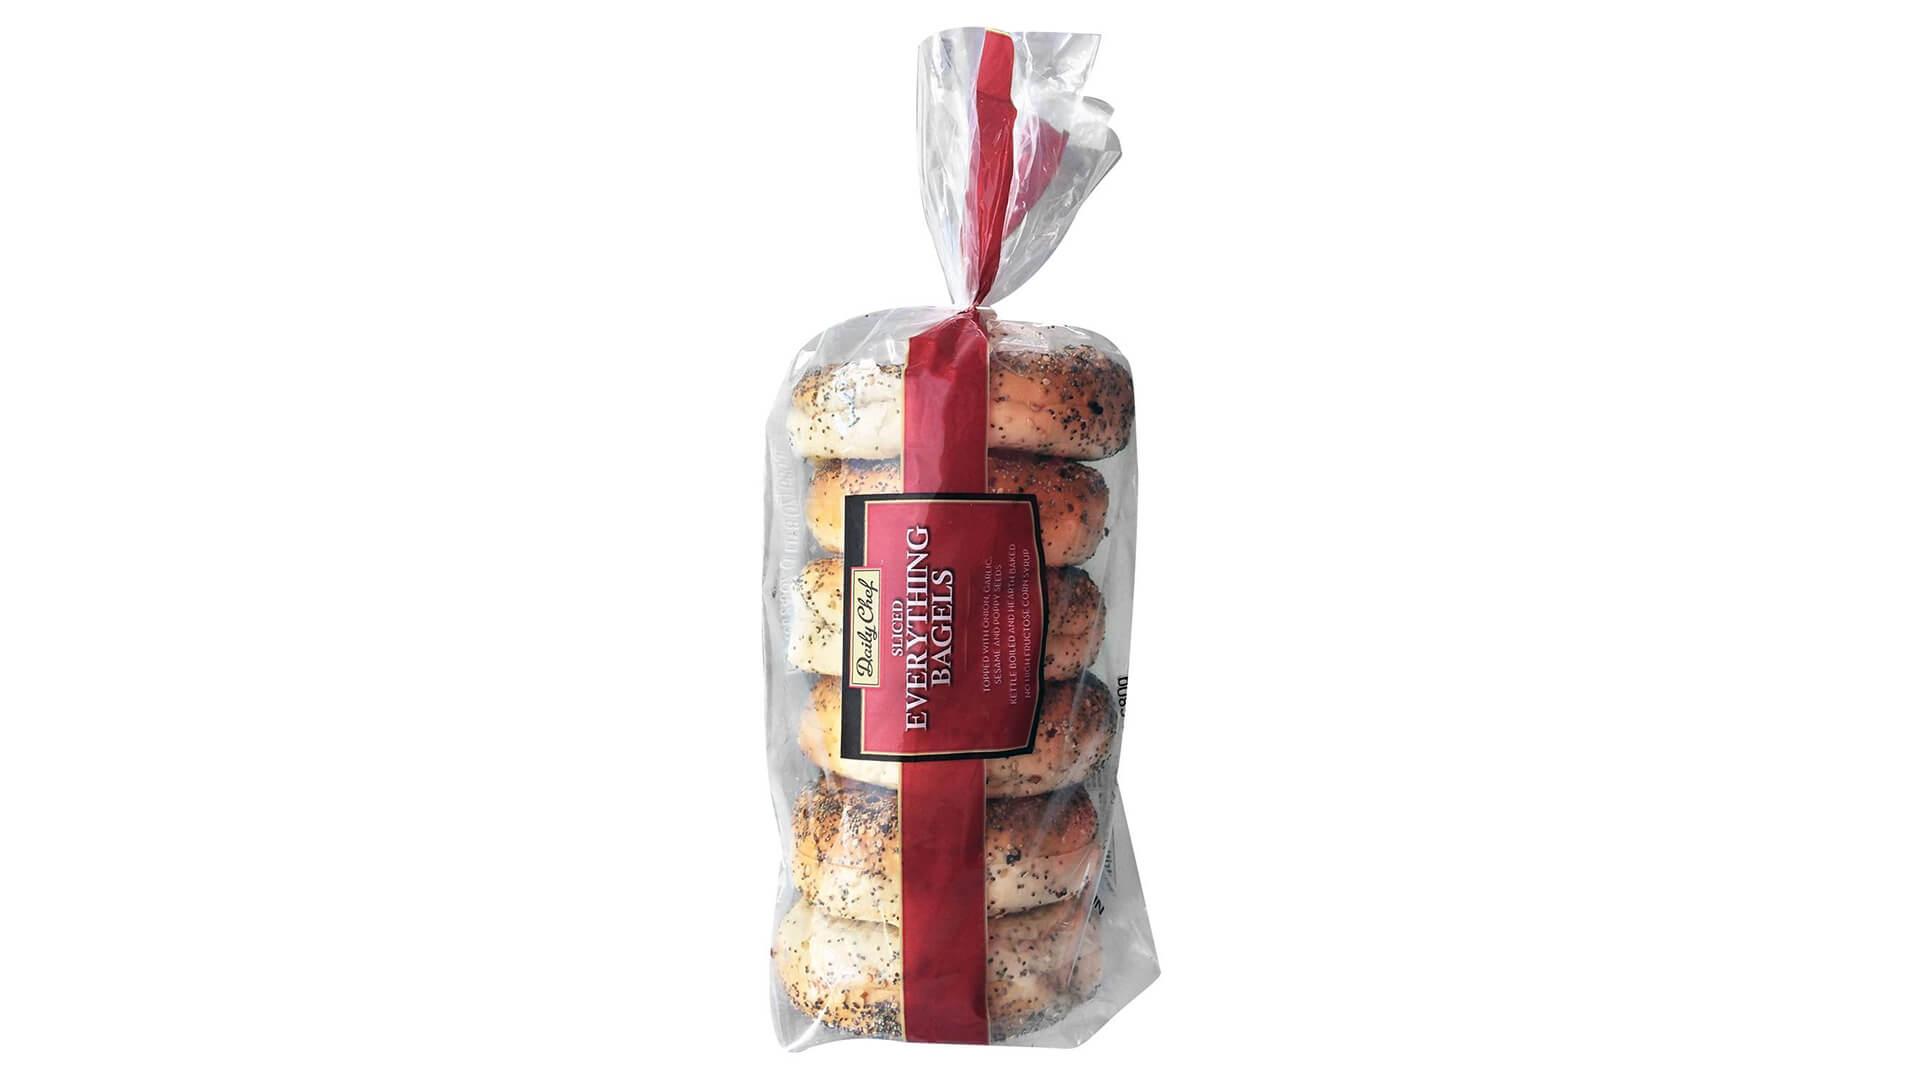 My baby a bag of half a dozen bagels